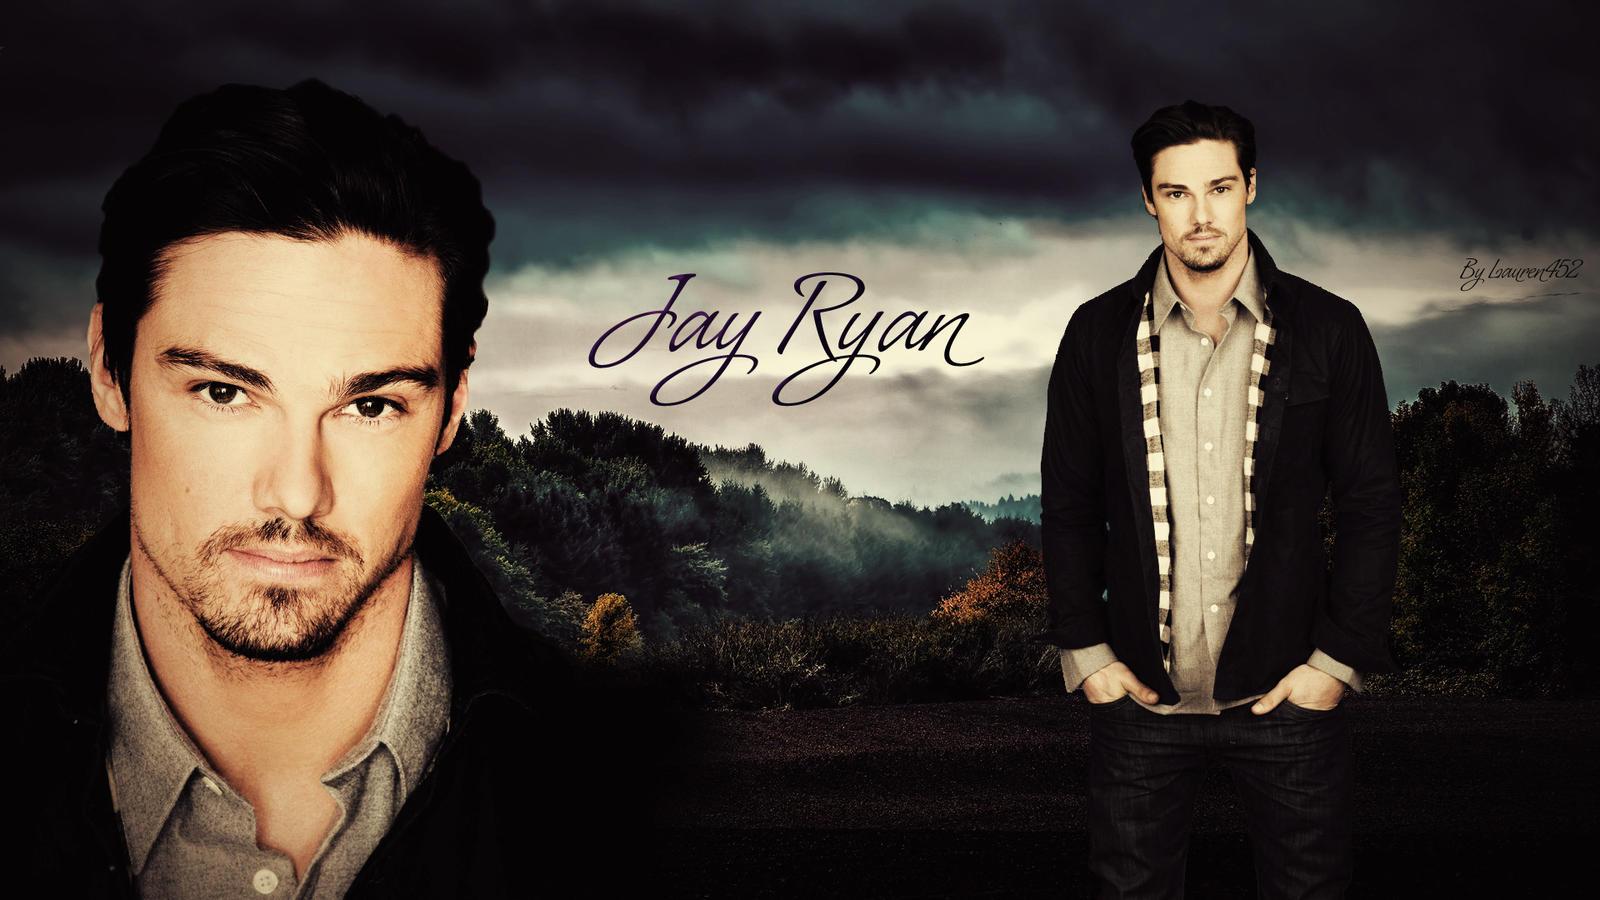 Jay Ryan by Lauren452 on DeviantArt